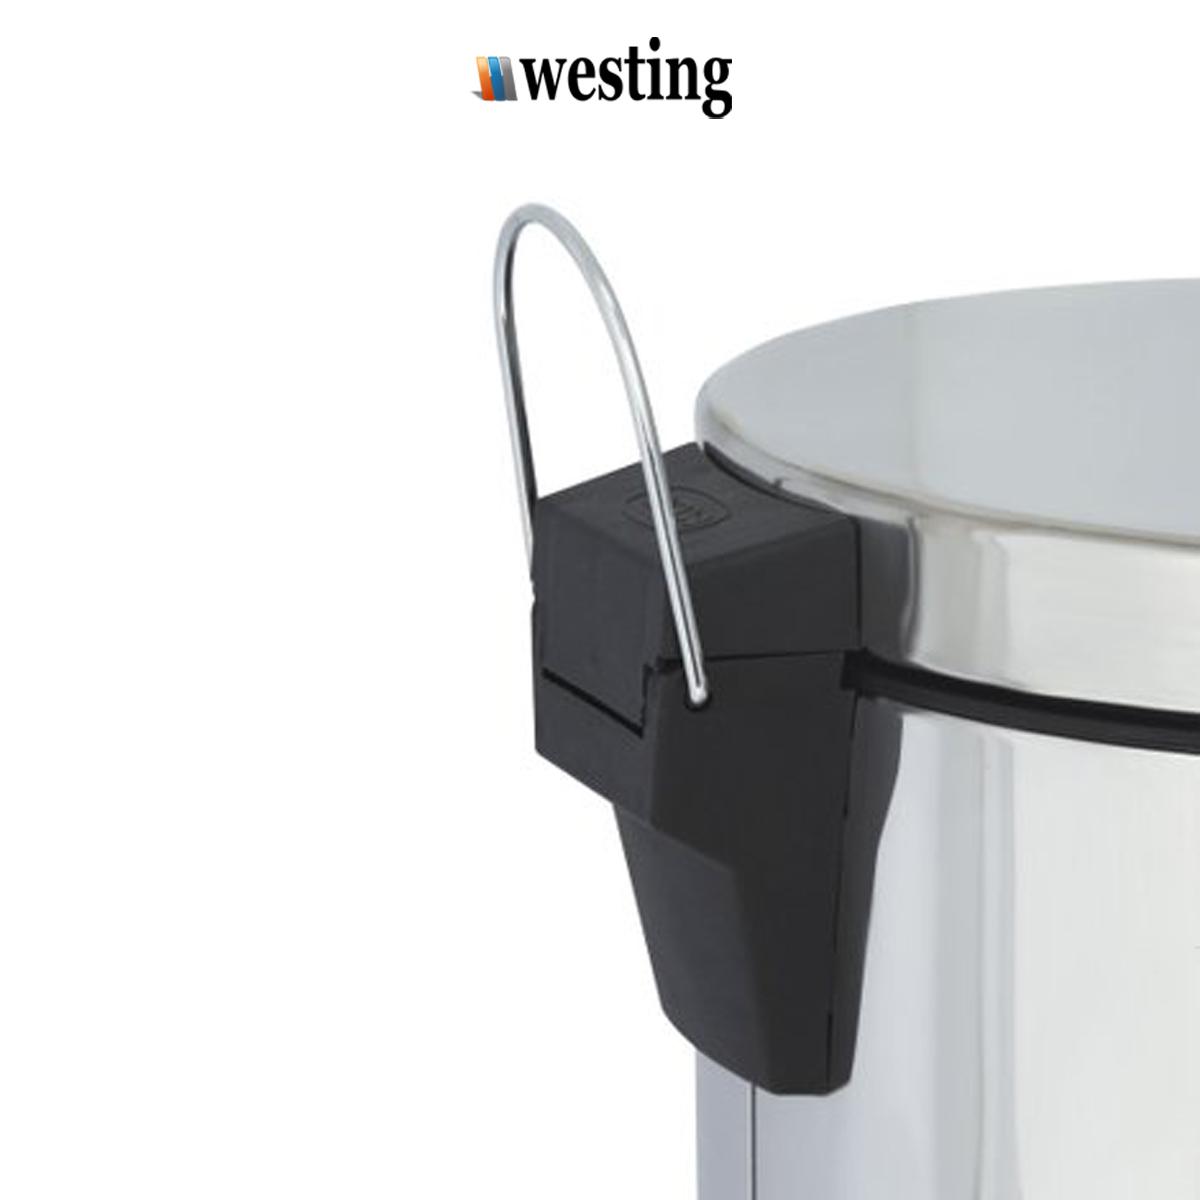 Lixeira Pedal Inox 3 Litros c/ Balde Interno Acabamento Polido - Westing